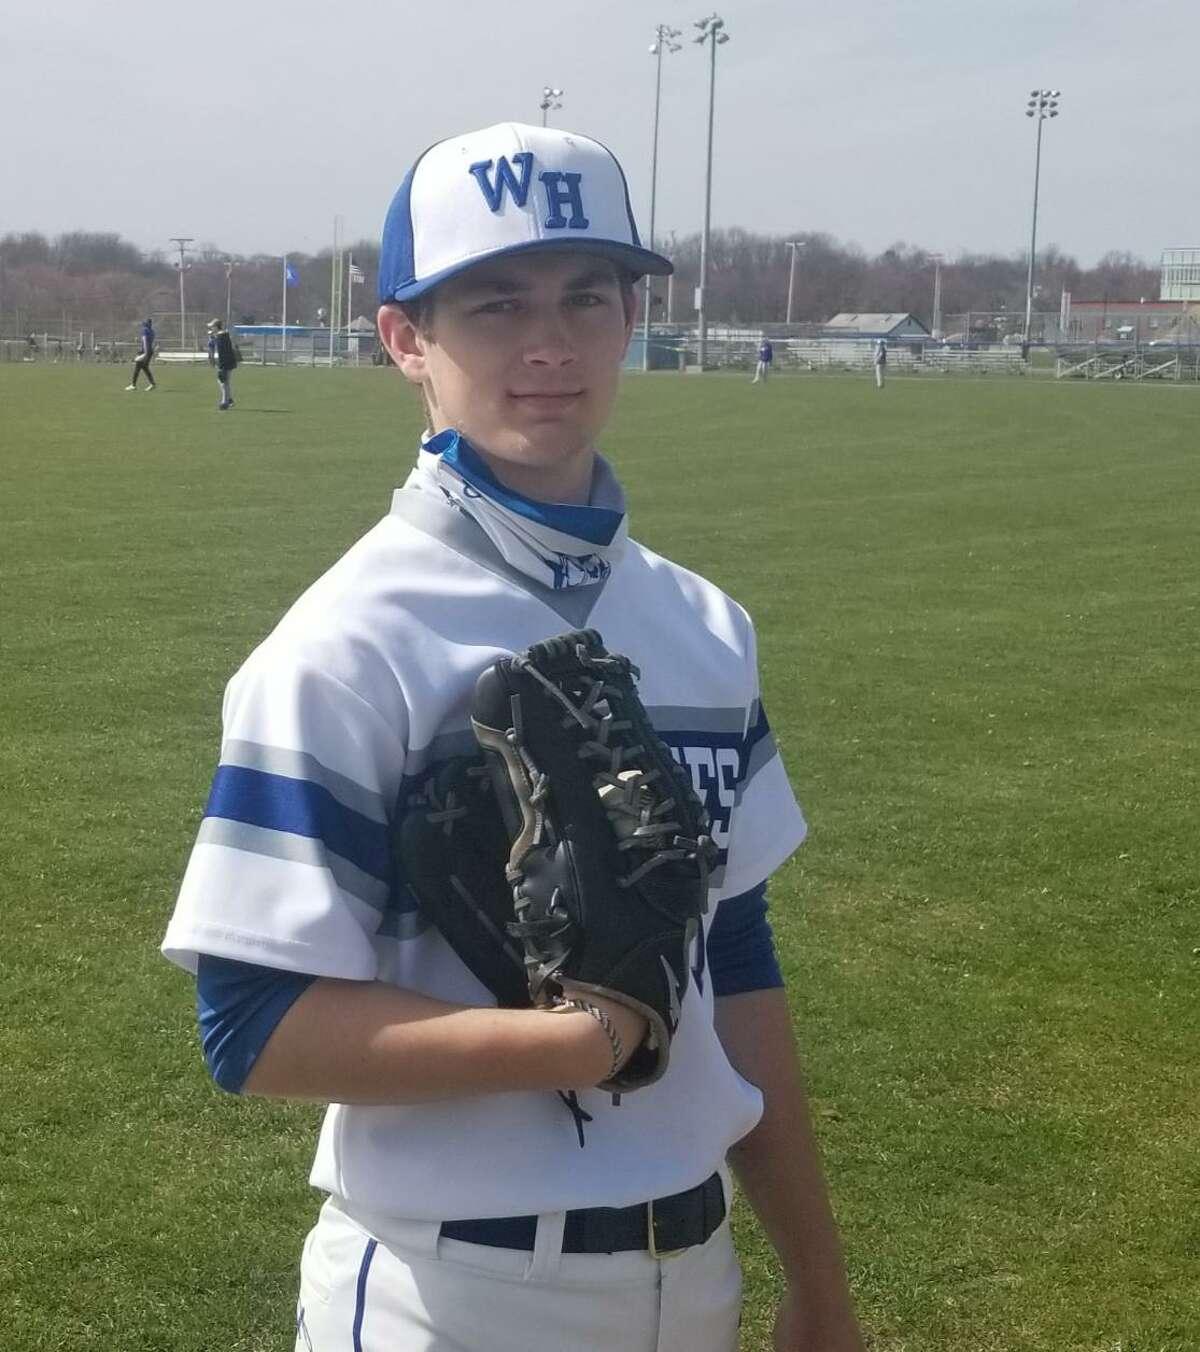 West Haven senior Hunter Axelrod is a senior co-captain for the baseball team.